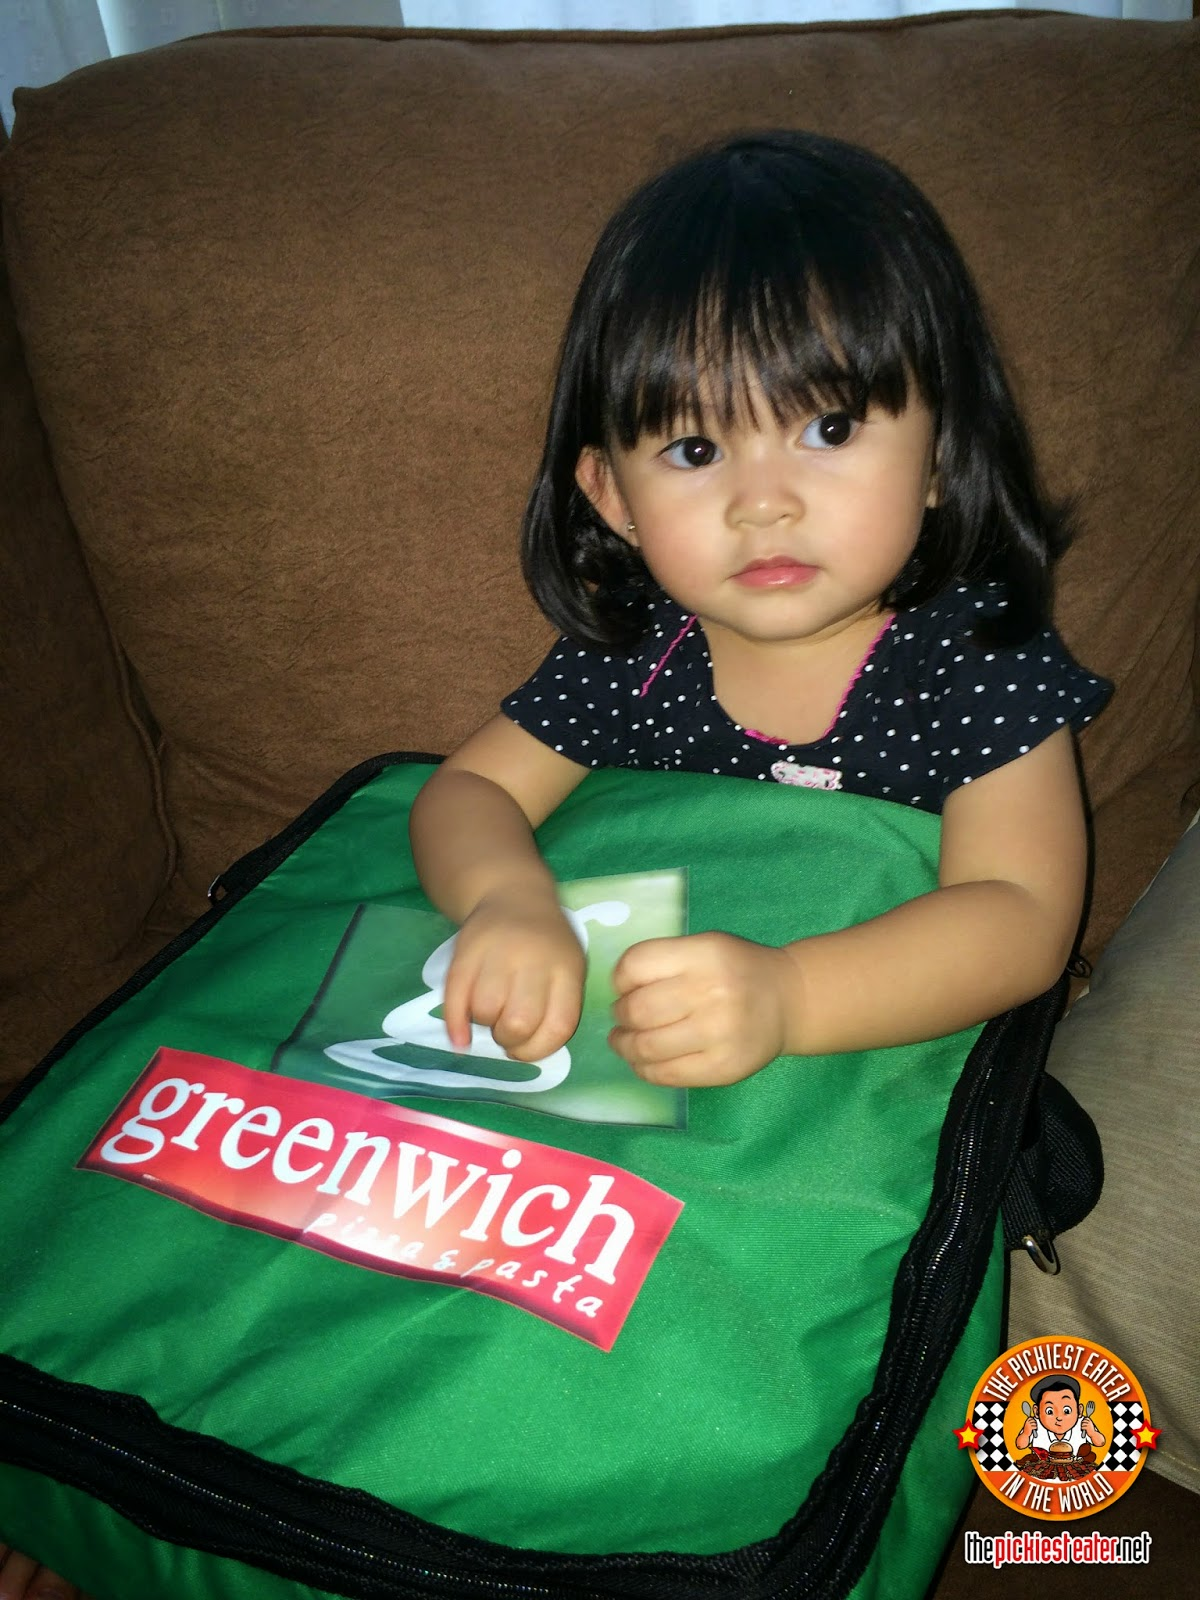 greenwich baby